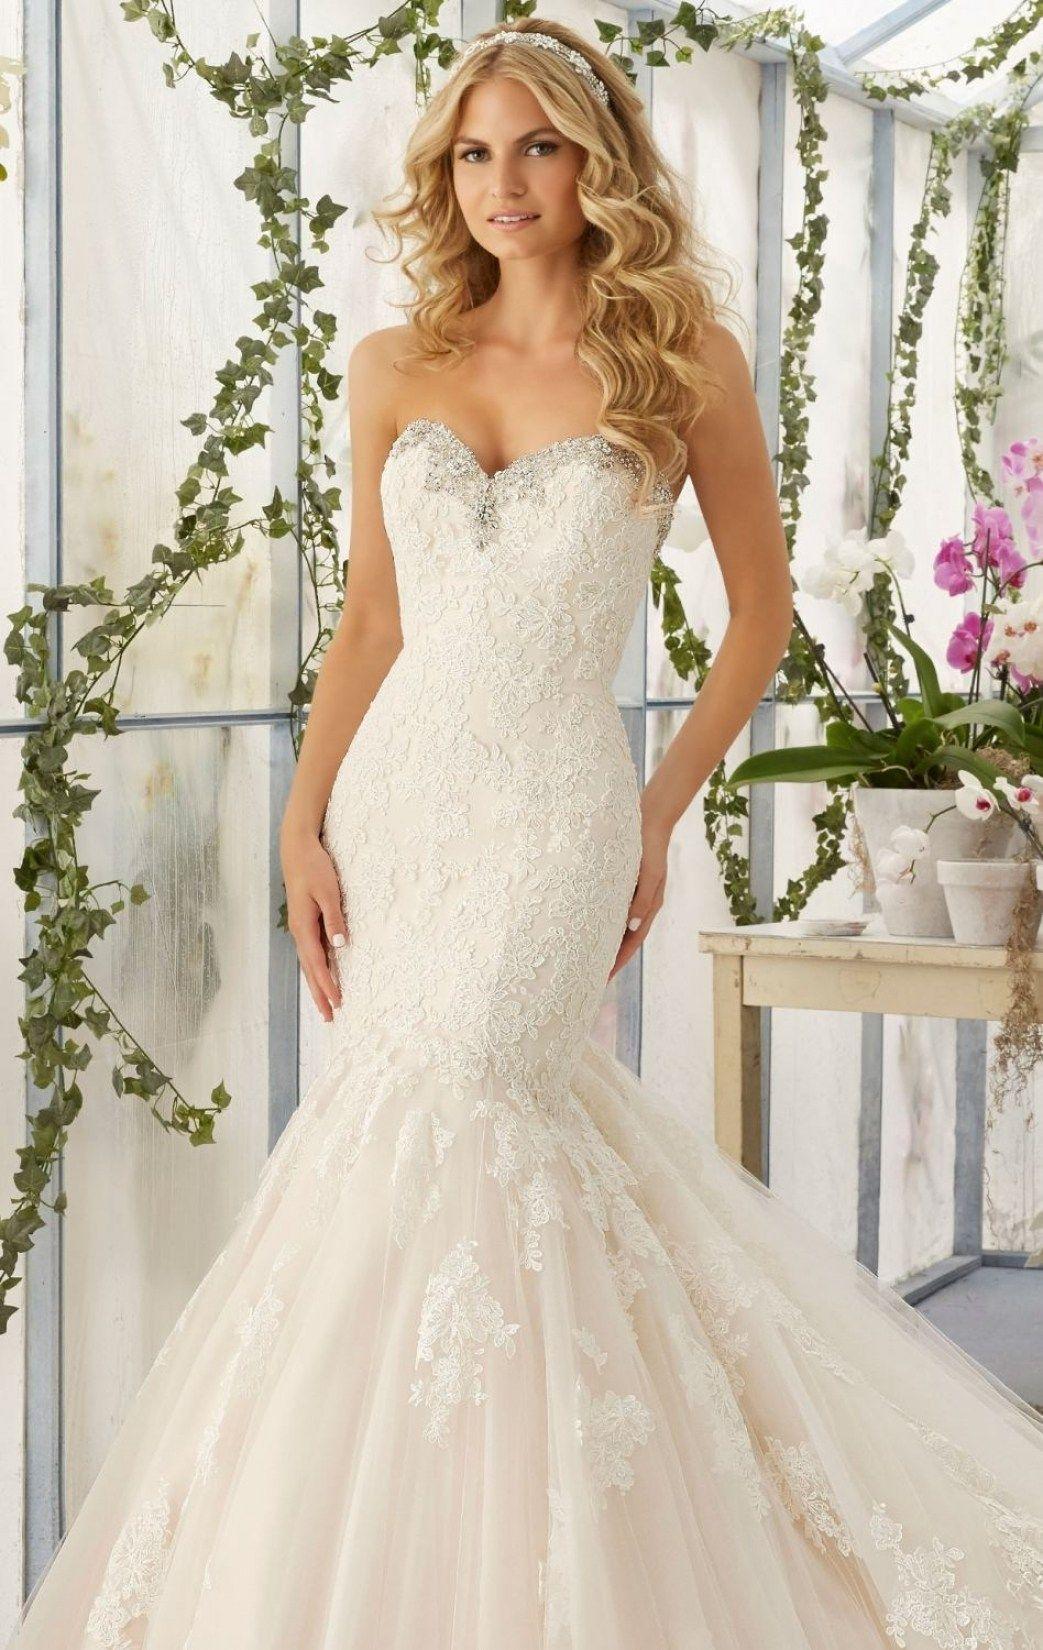 35 Beautiful White Corset Under Wedding Dress Ideas Wedding